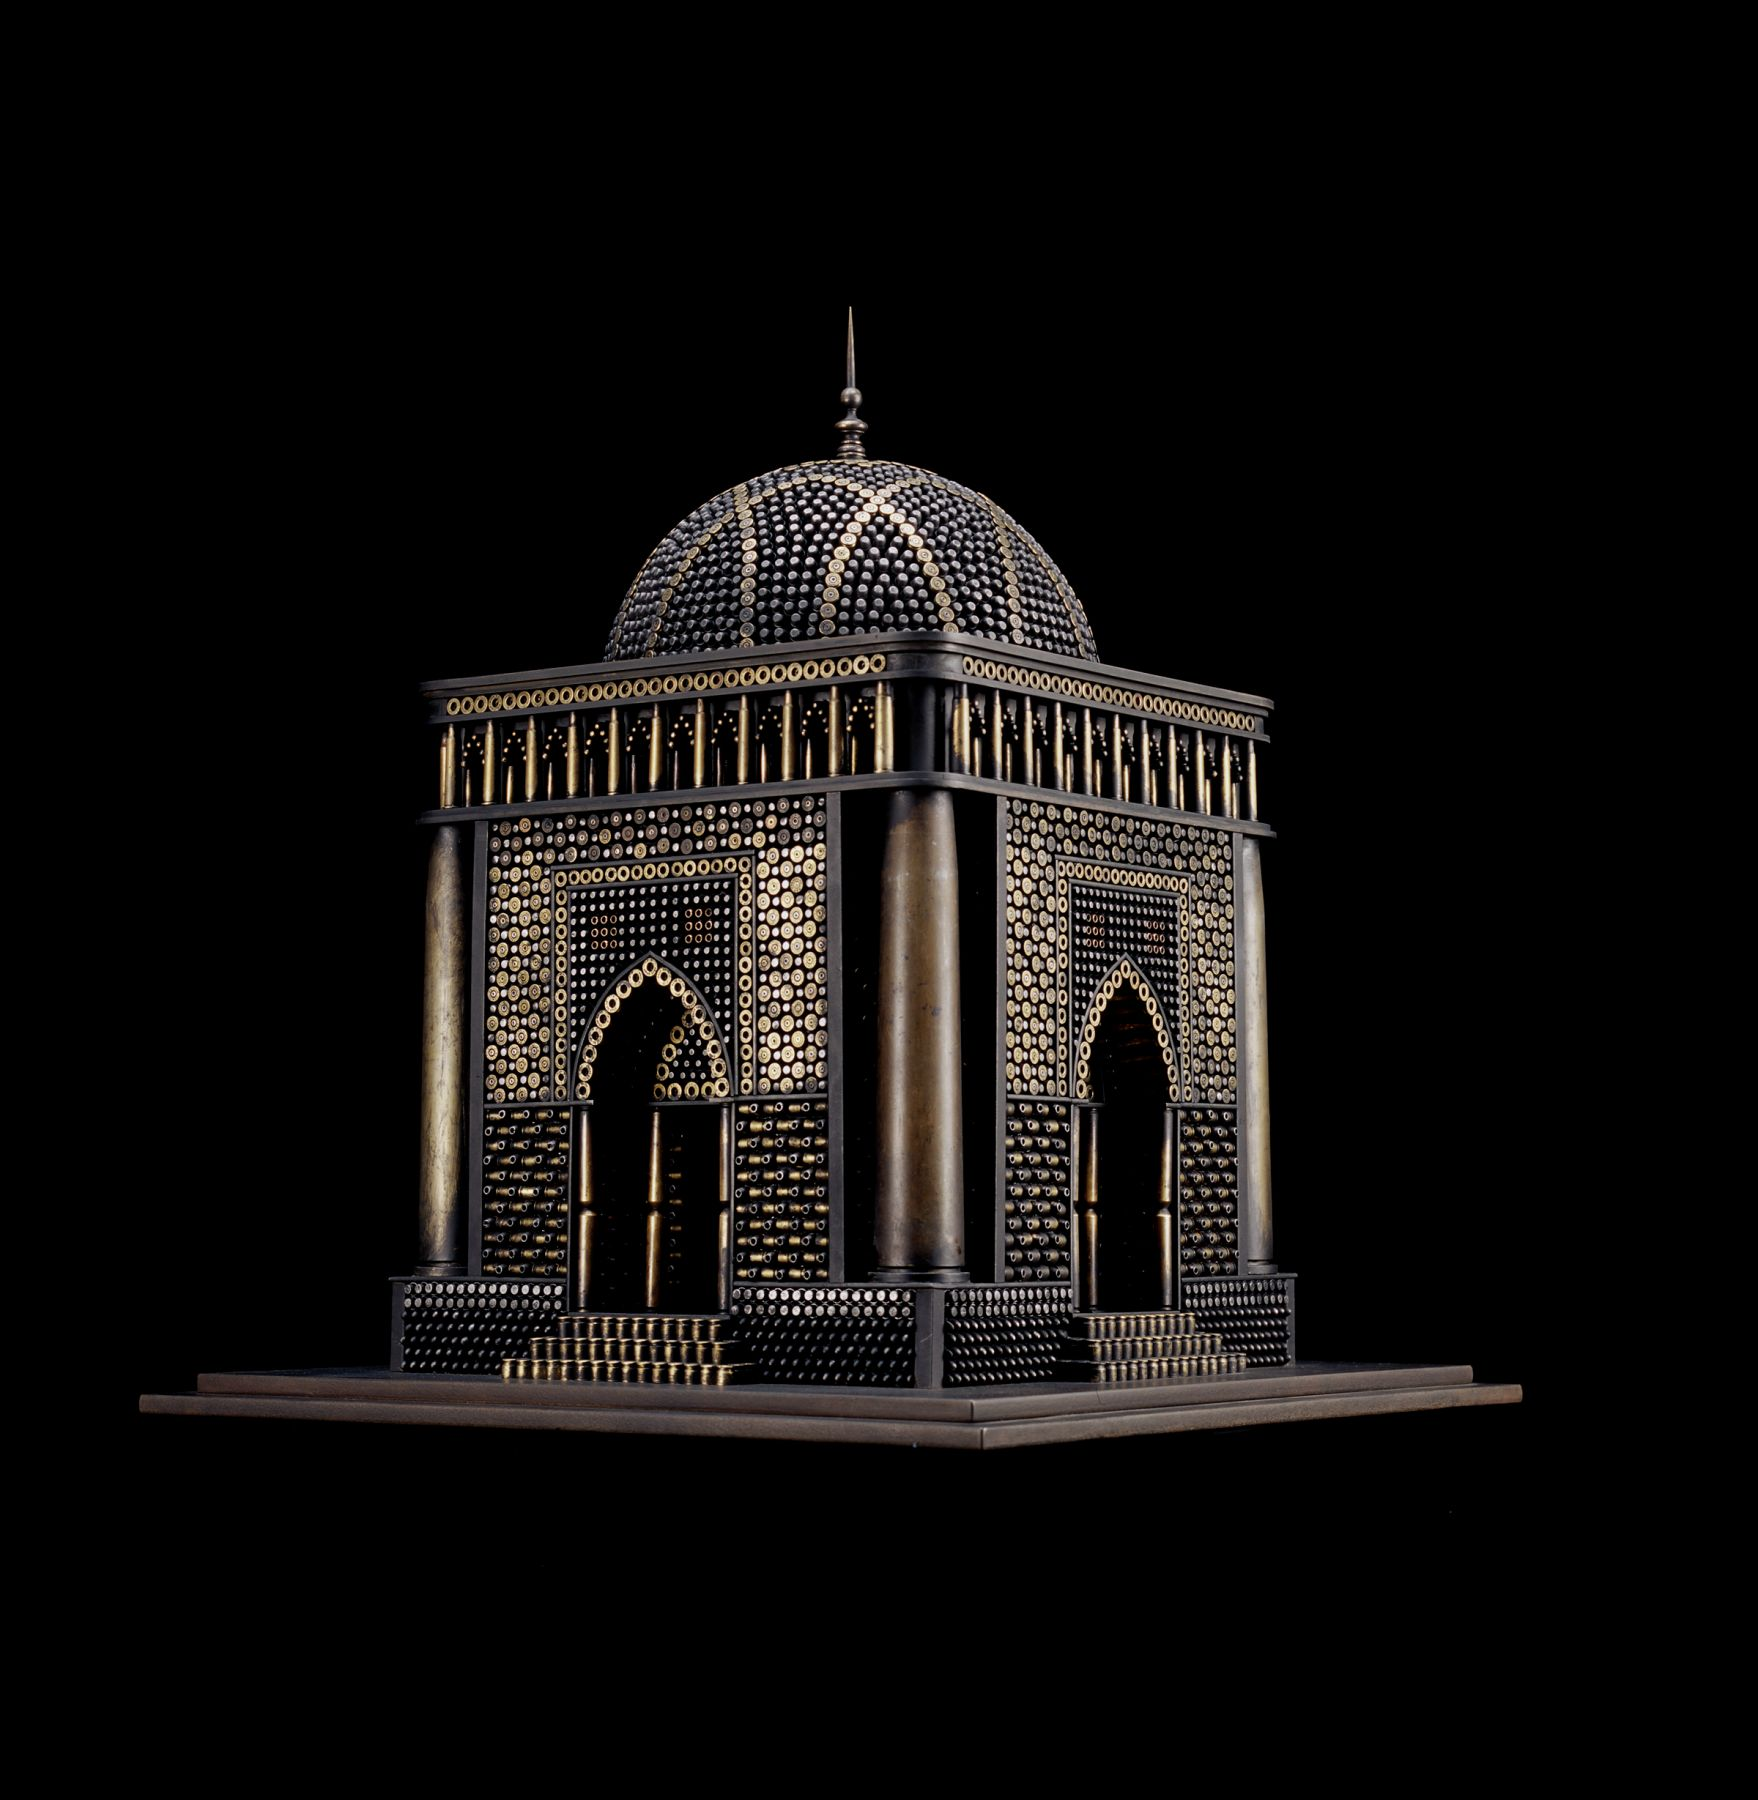 Al Farrow, Mausoleum II, 2008, bullets, artillery shells, steel, 29 x 24 x 24 inches